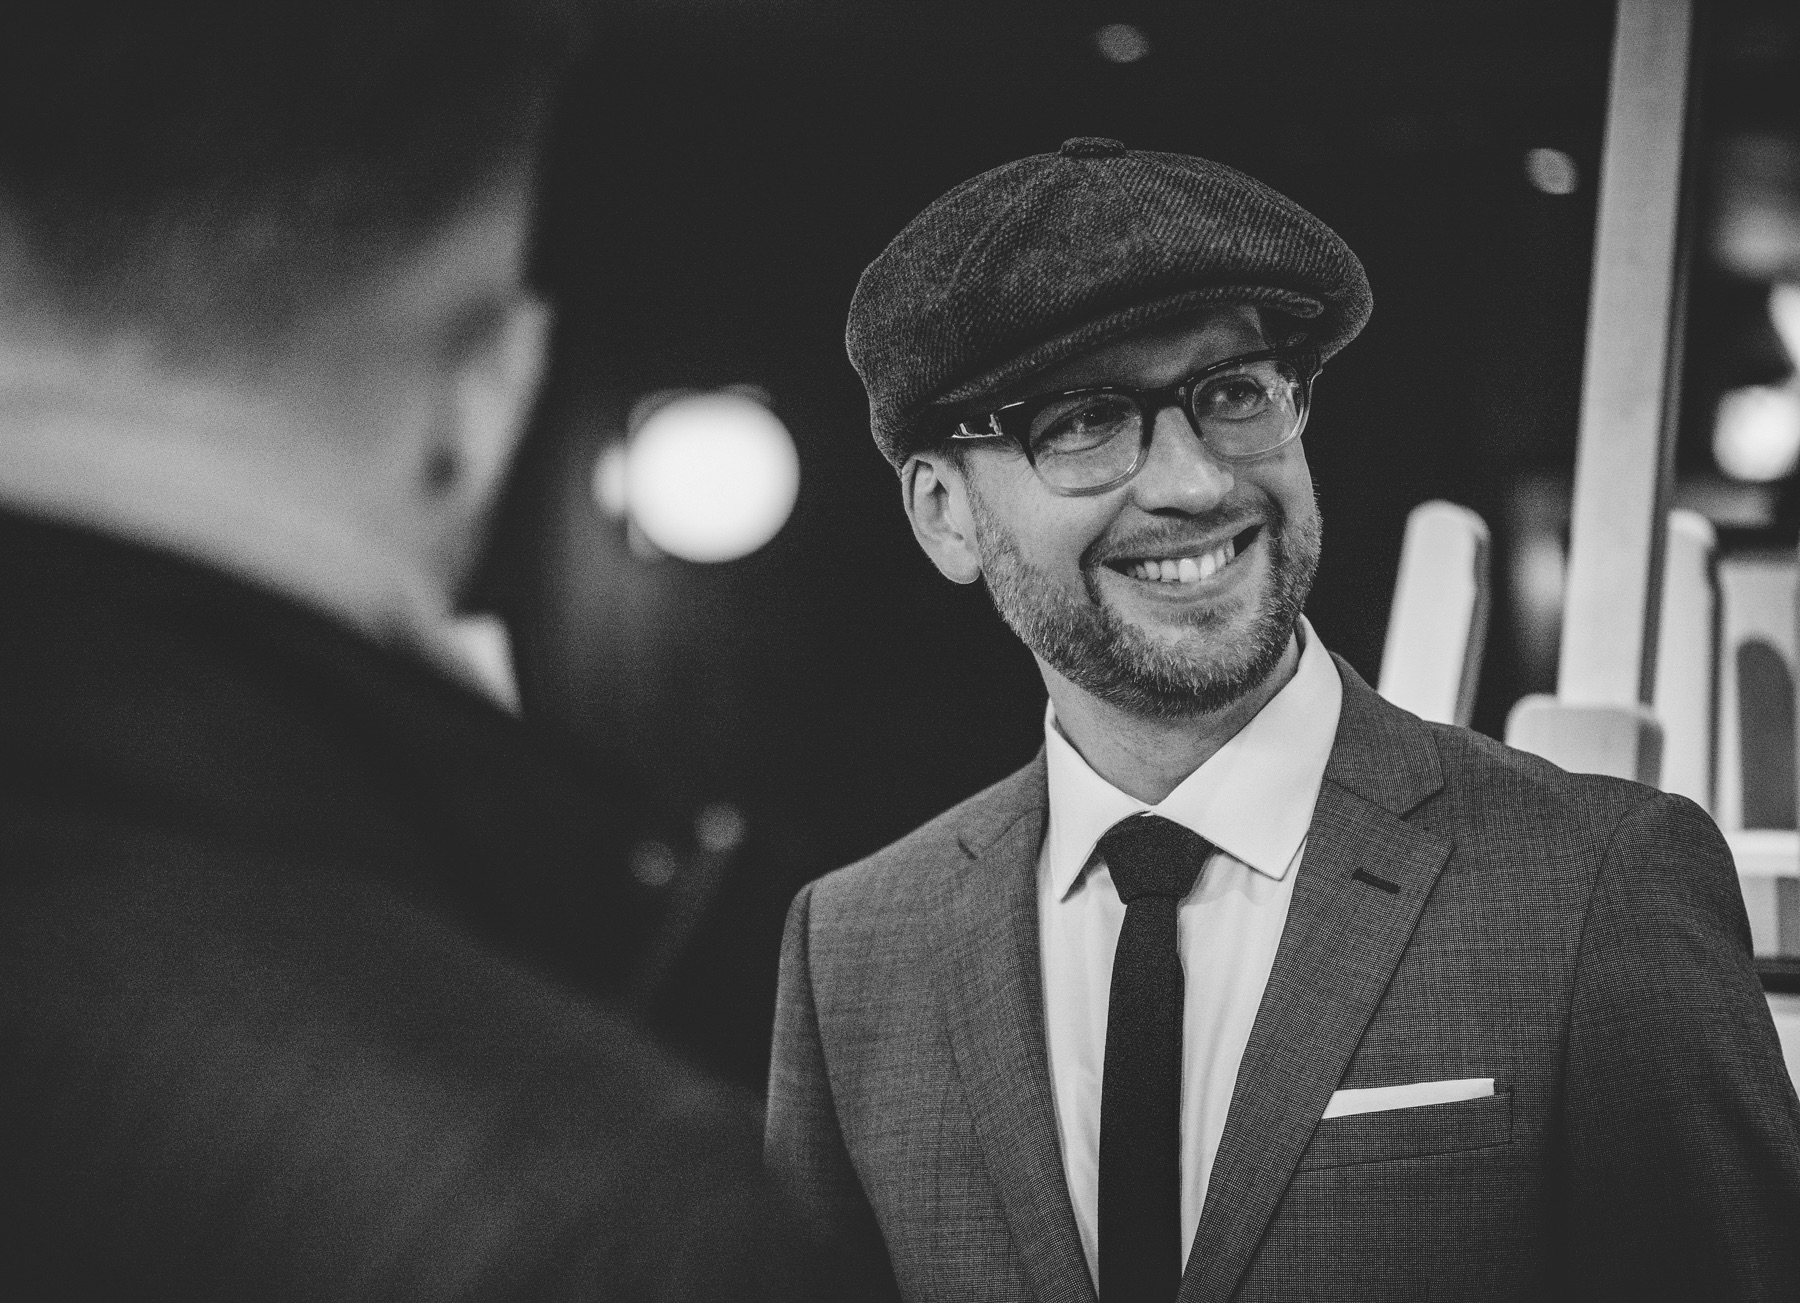 Jay McLaughlin Grey Suit Pocket Square Tie Newsboy Cap Photographer Olympus PEN Ambassador